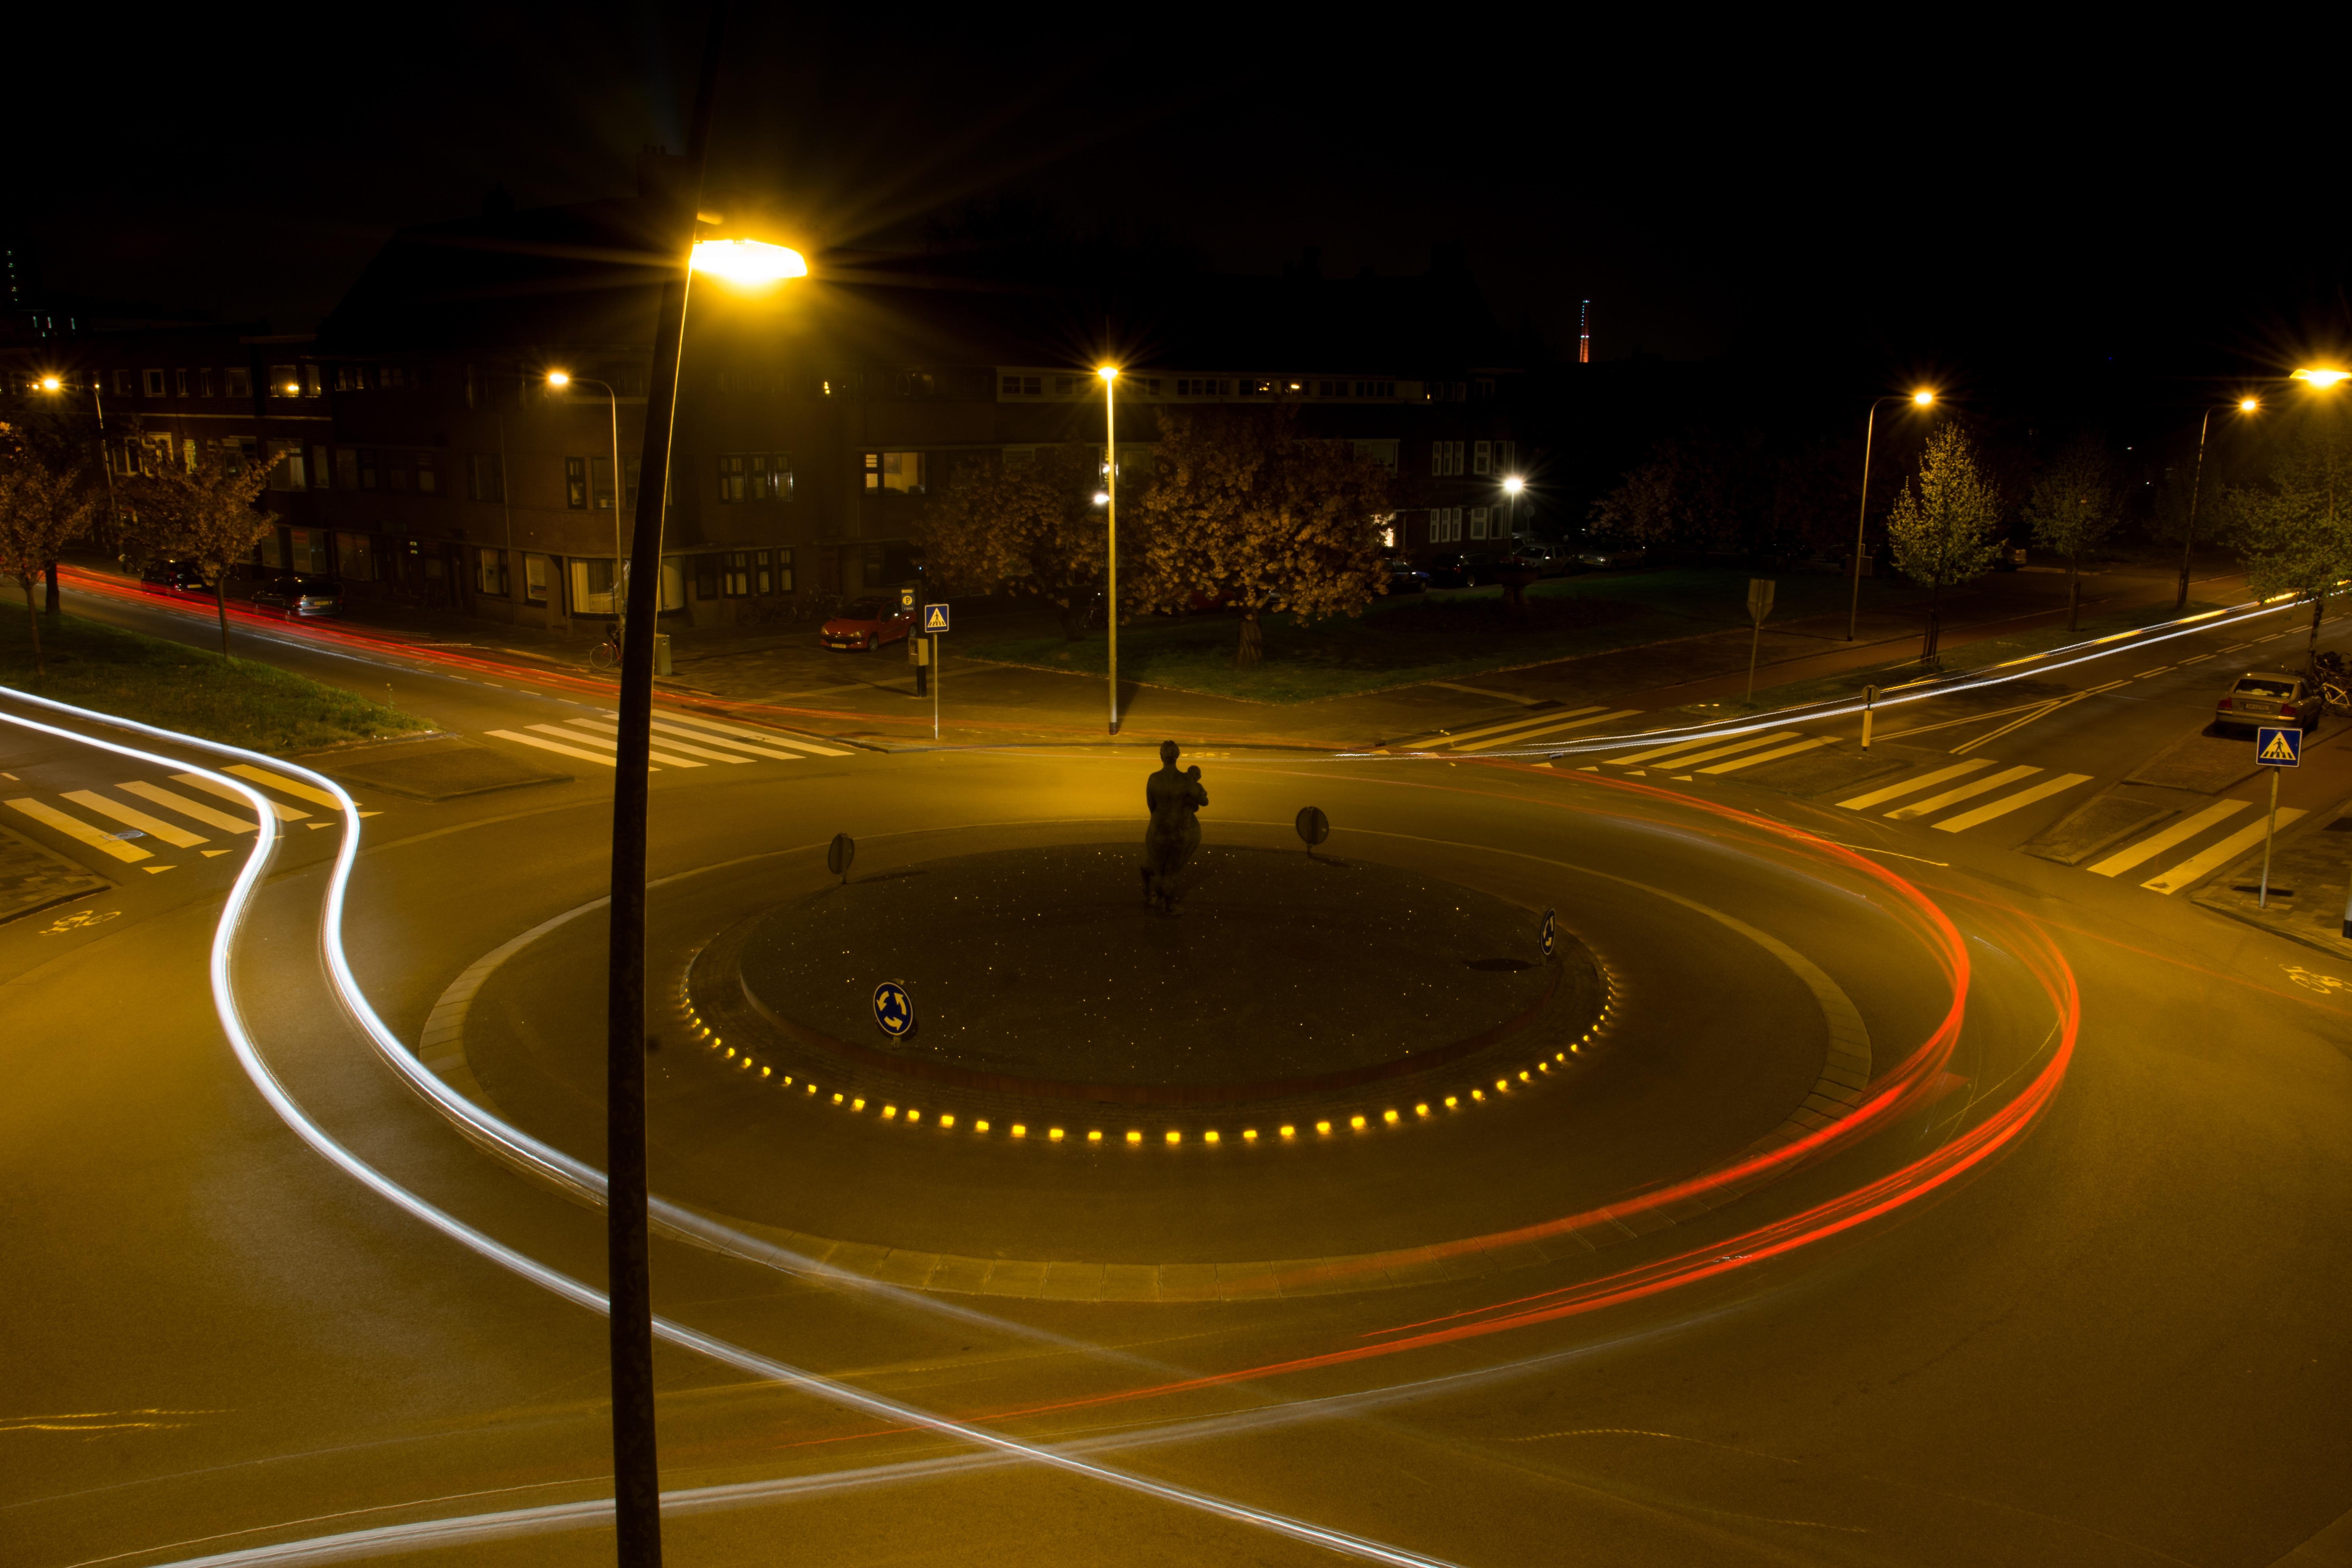 Images Gratuites Lumiere Route Circulation Rue Nuit Matin